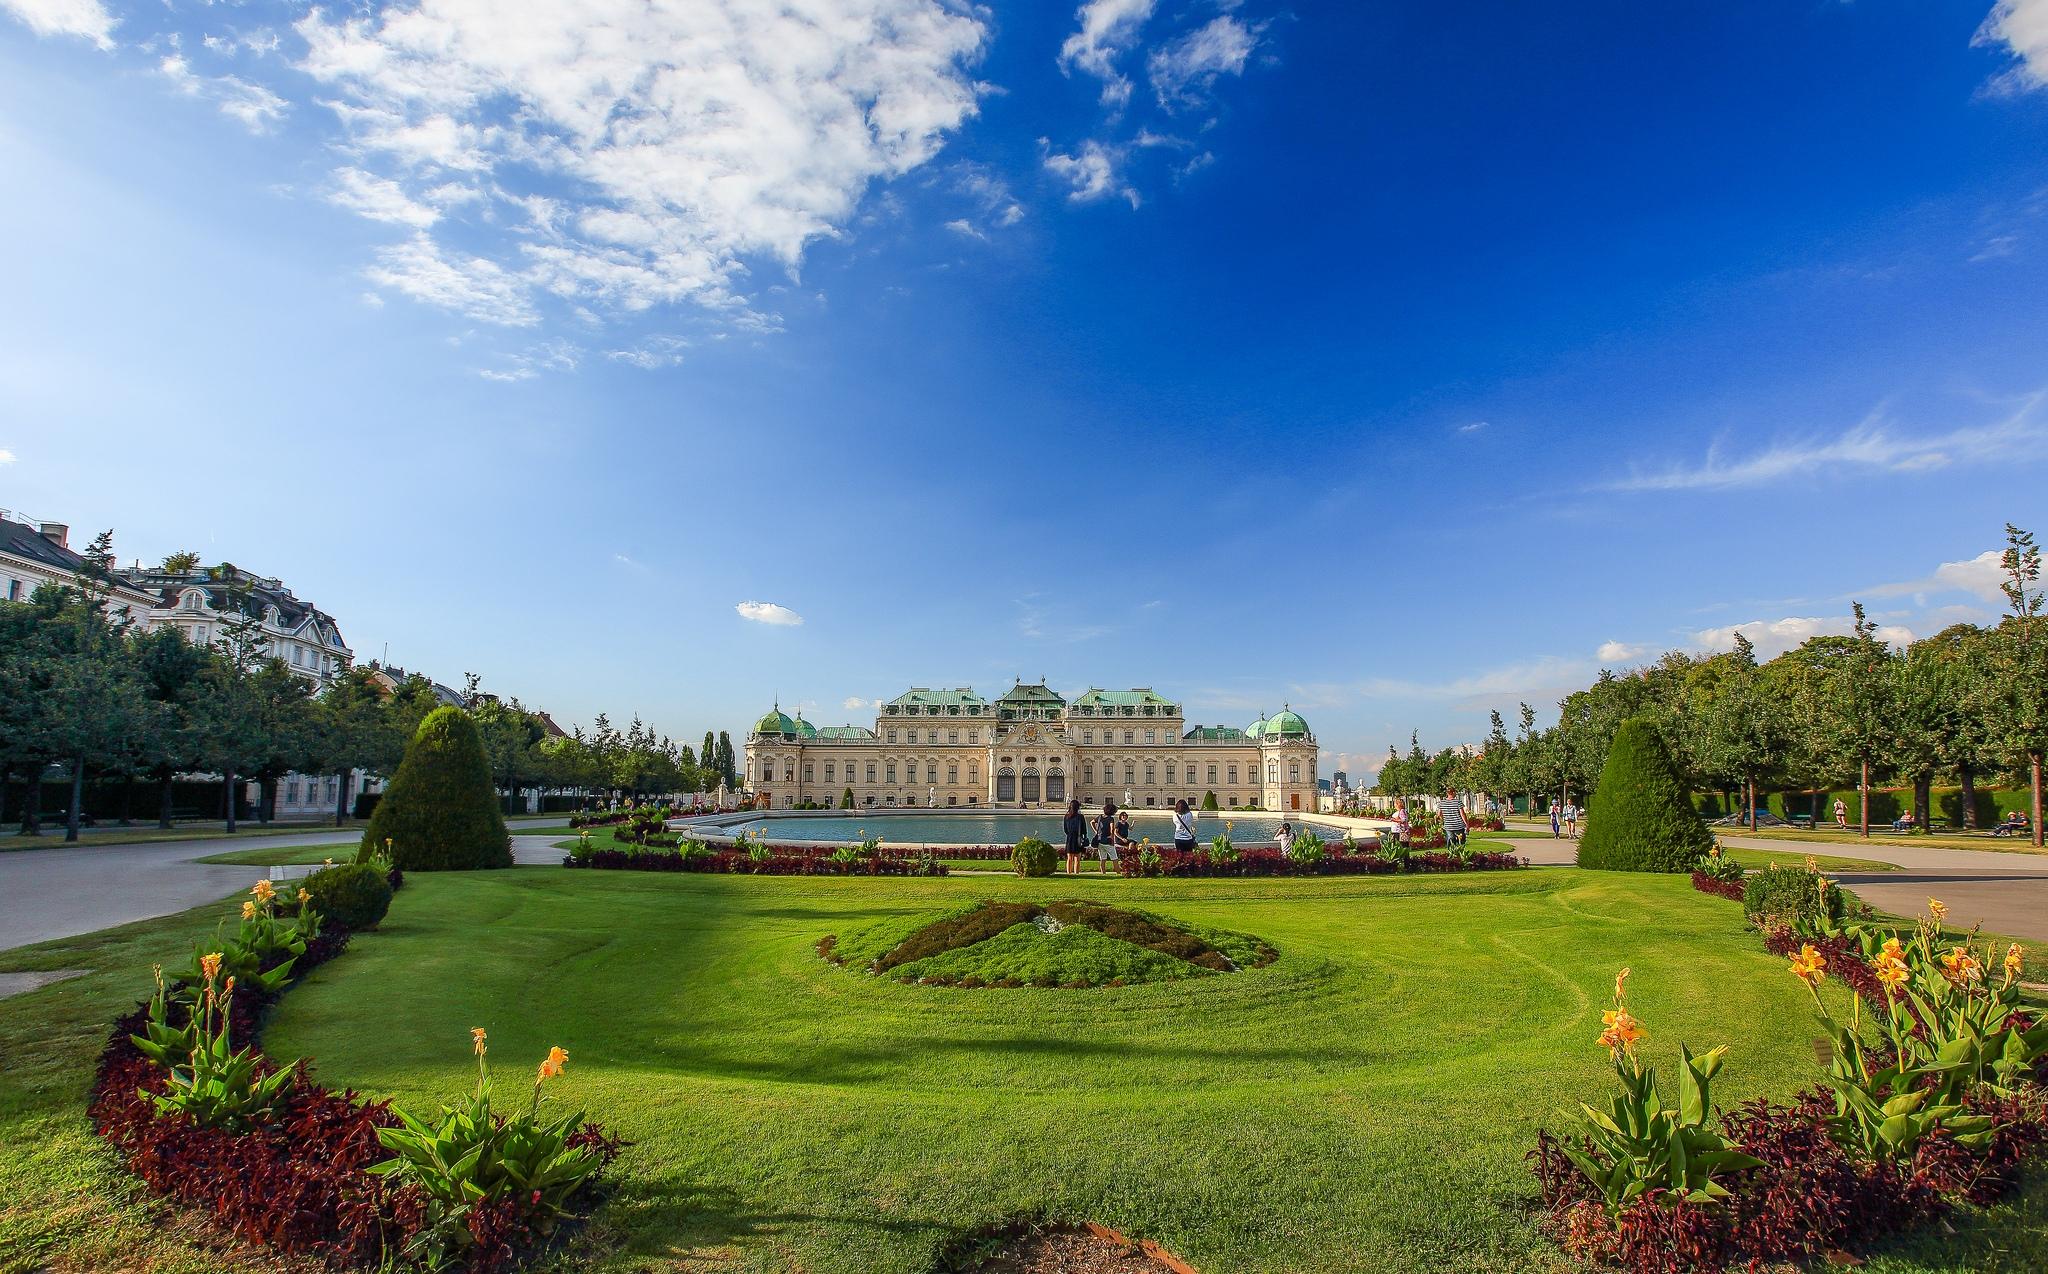 Belvedere.Palace